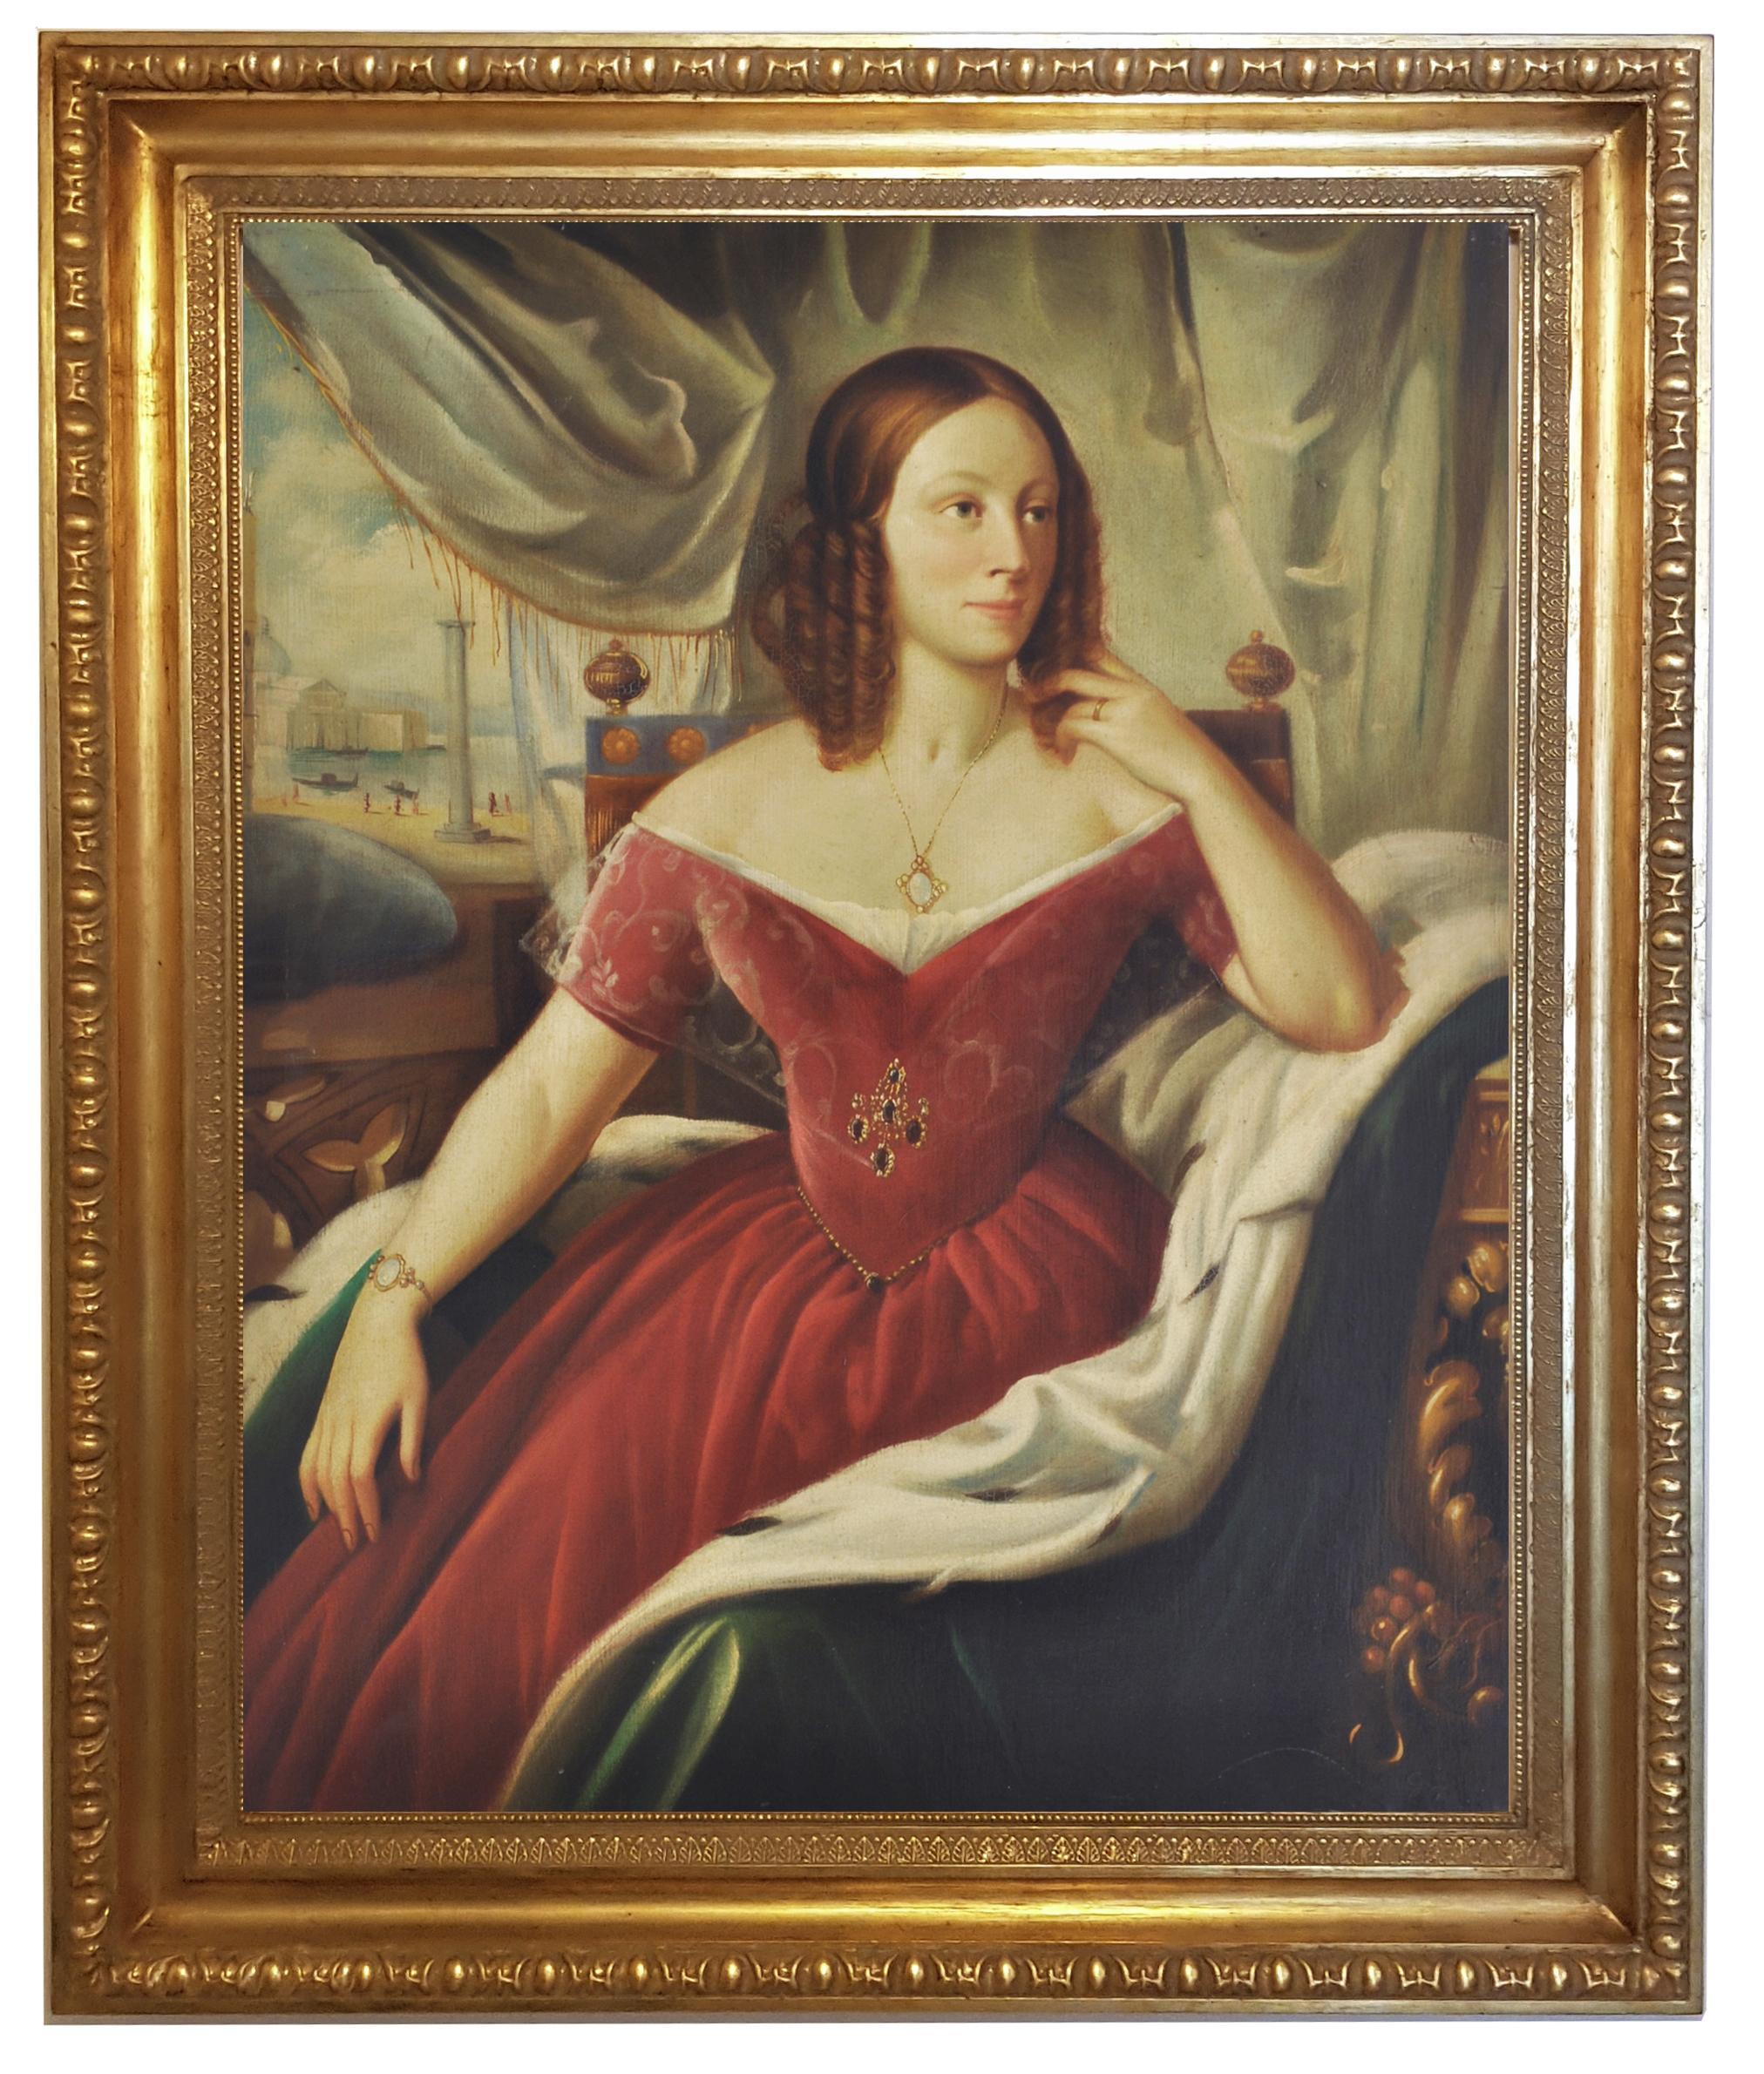 LADY'S PORTRAIT - Venetian School  - Oil on Canvas Italian Figurative Painting